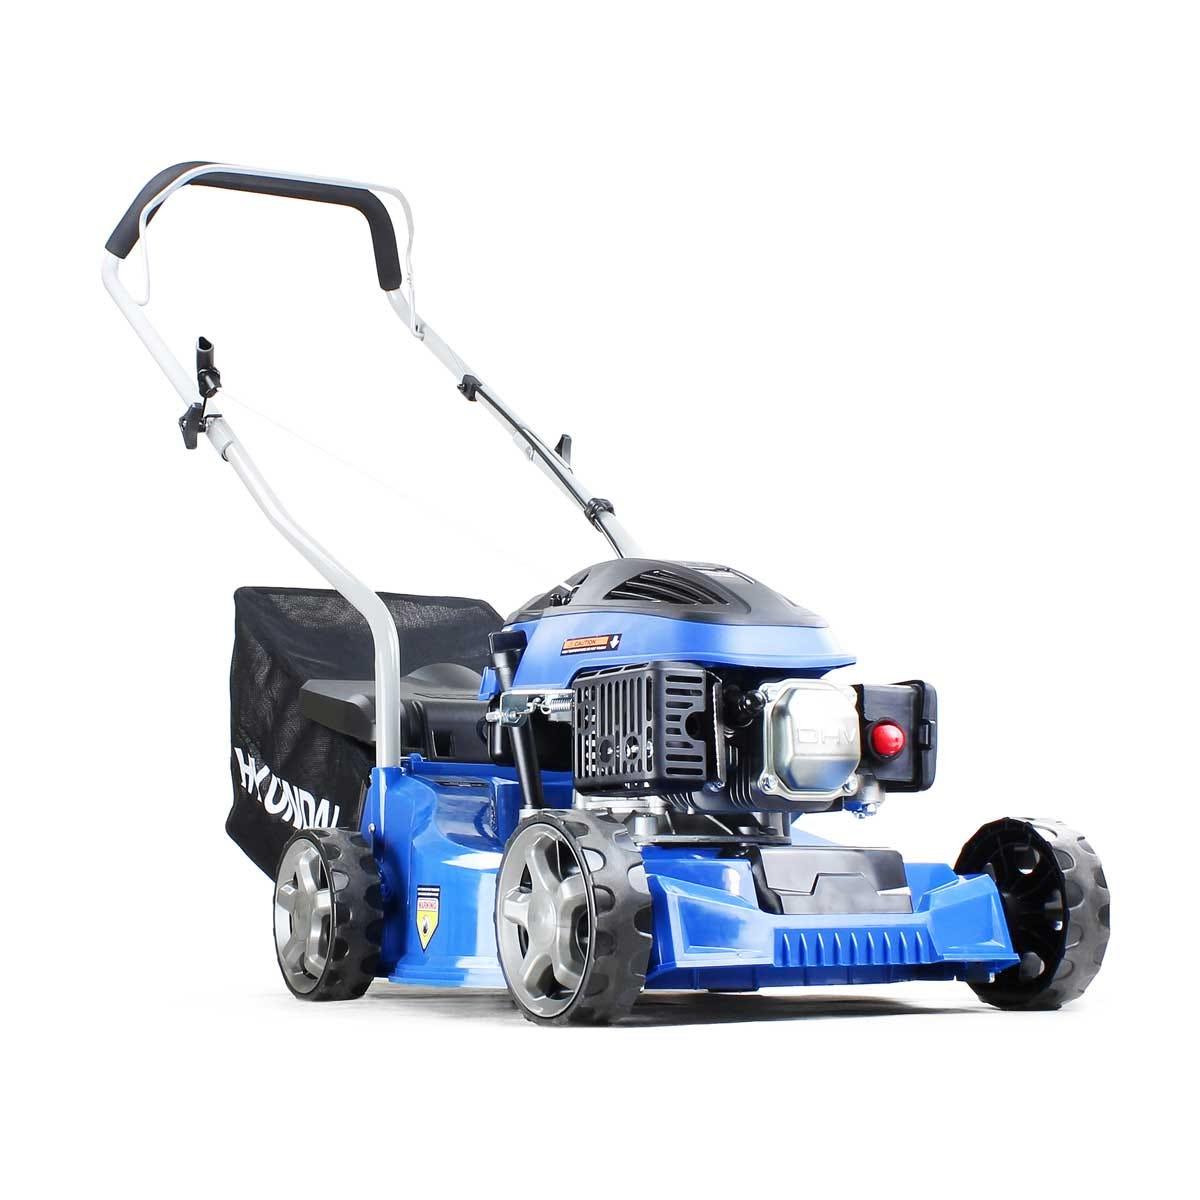 Hyundai HYM400P-4 79cc Push Rotary Petrol Lawn Mower